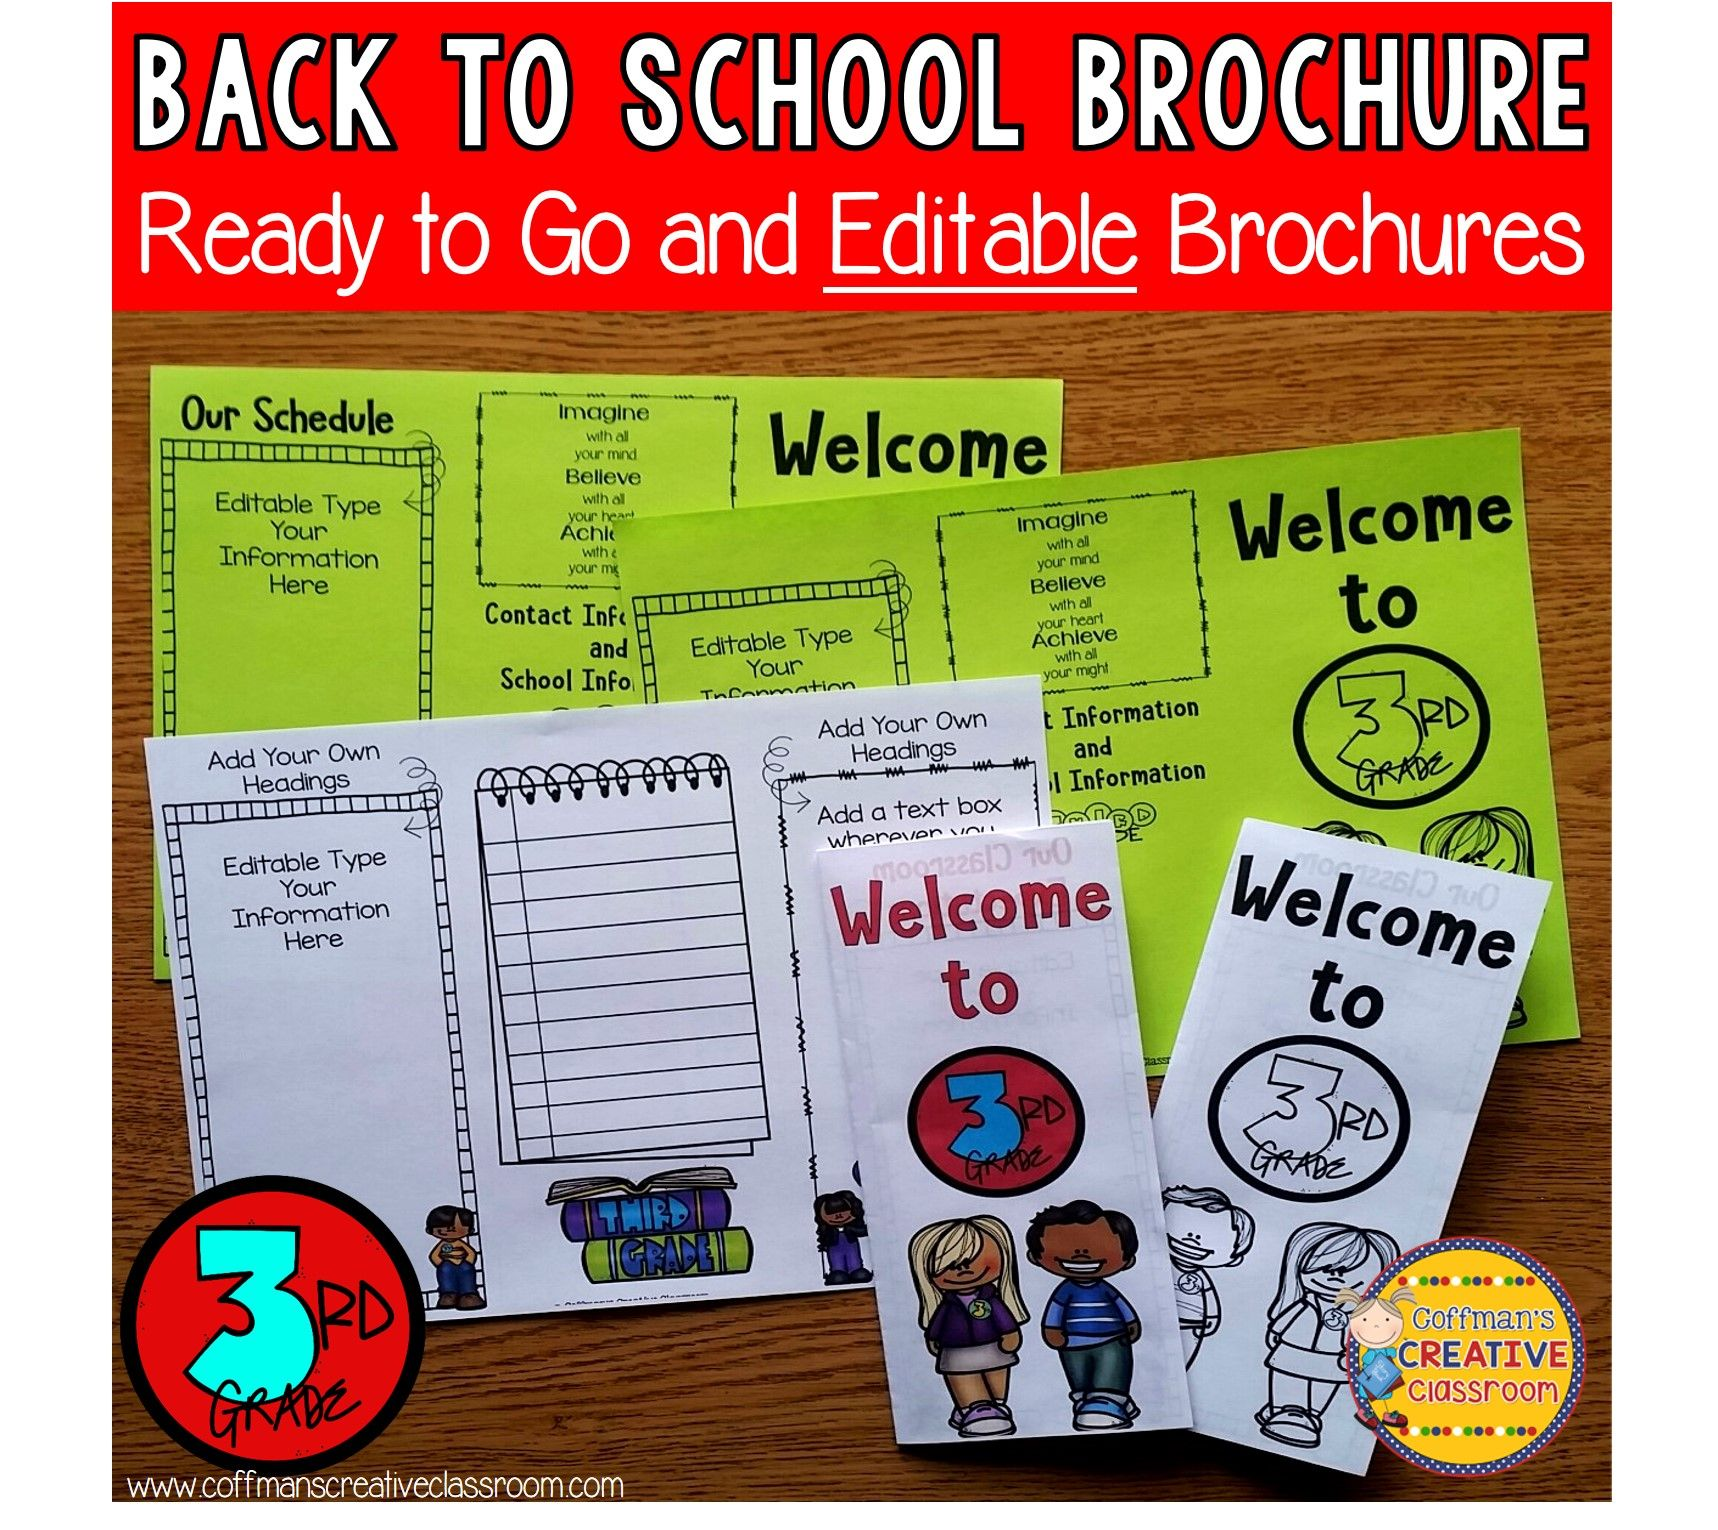 Back to school editable brochure 3rd grade school